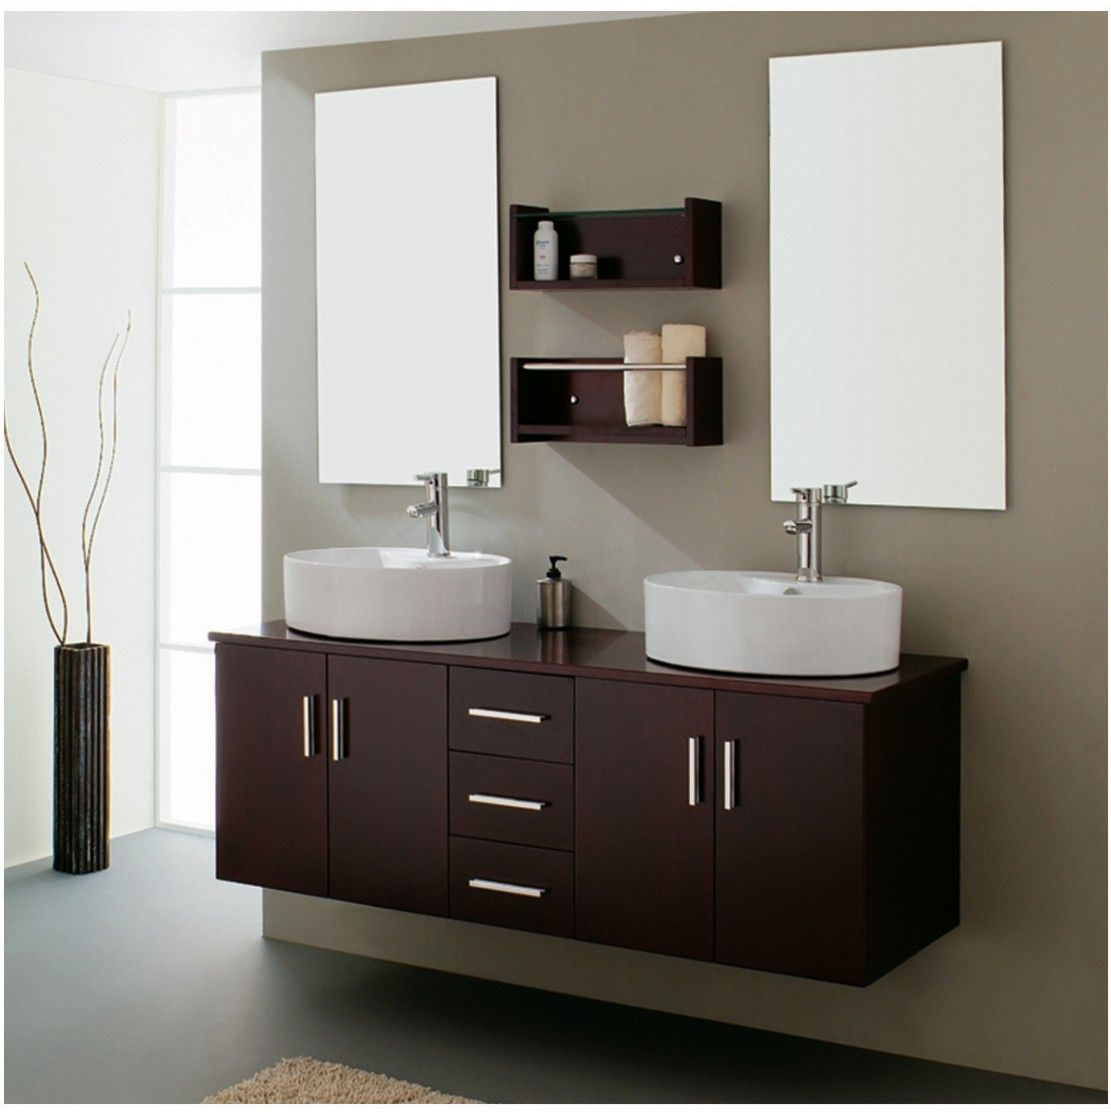 Best Amazing Modern Bathroom Design Ideas To Increase Home 640 x 480